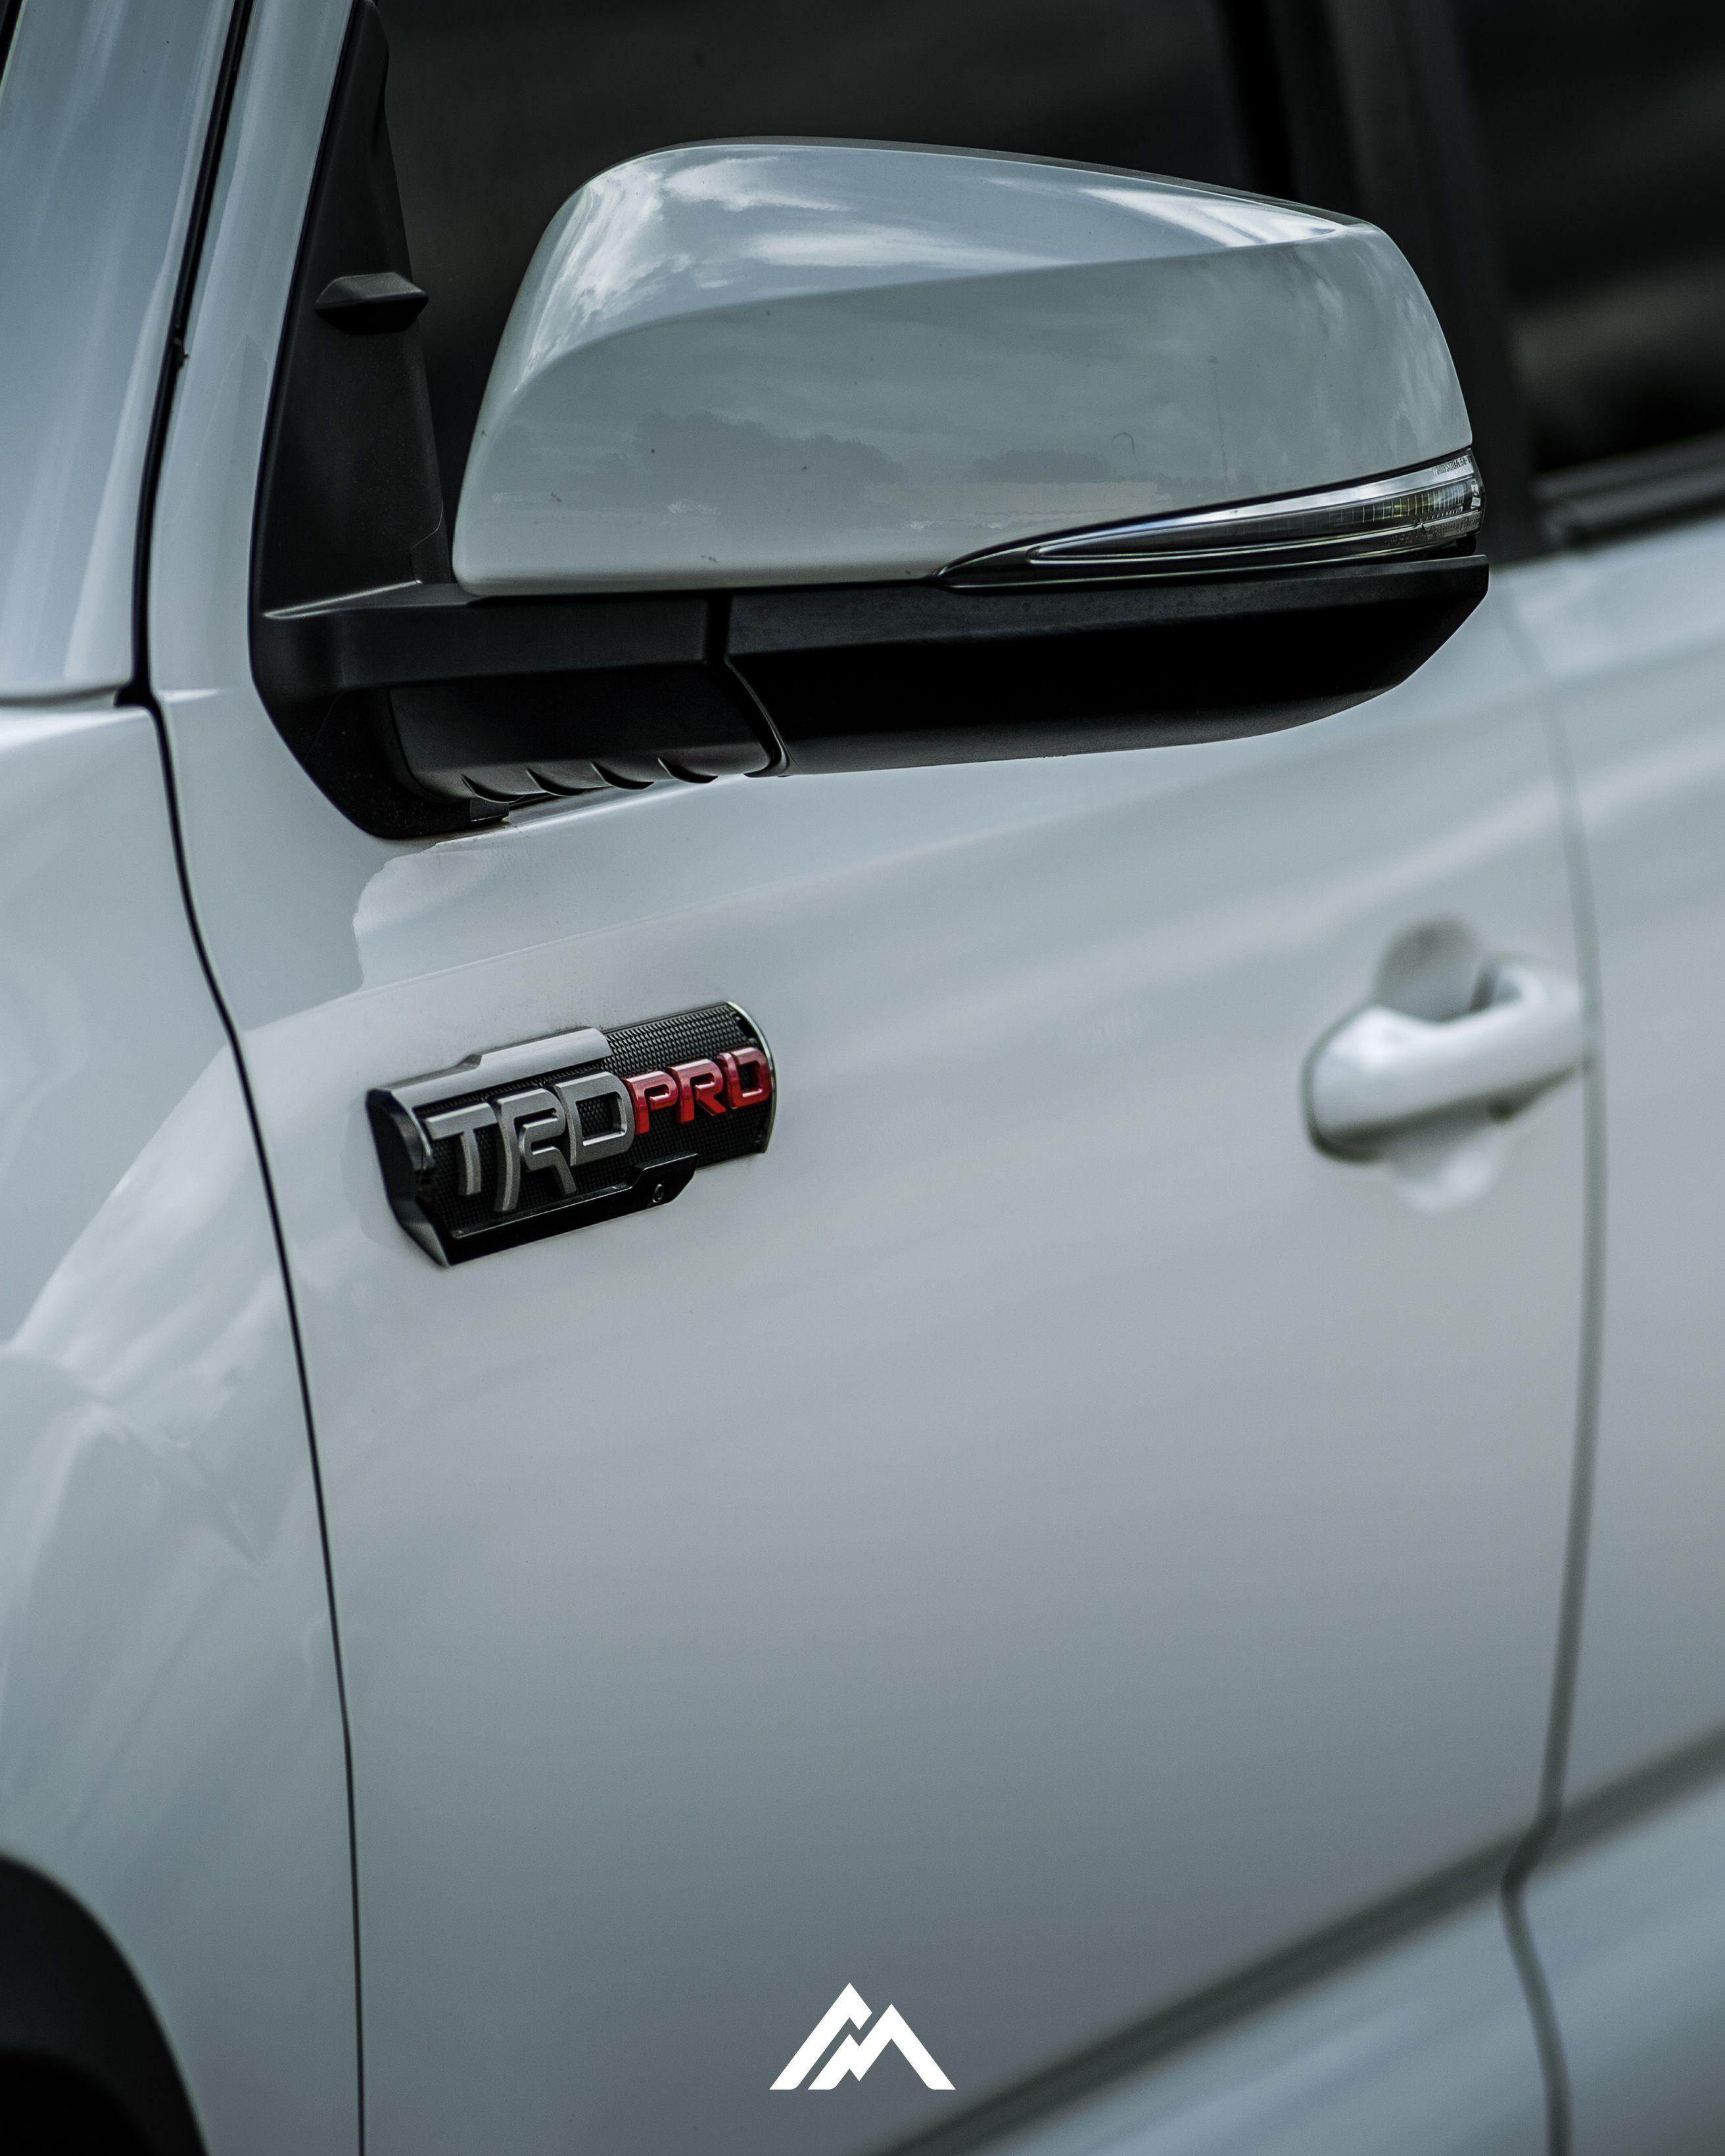 Pin on Lifted Trucks at Northwest Motorsport